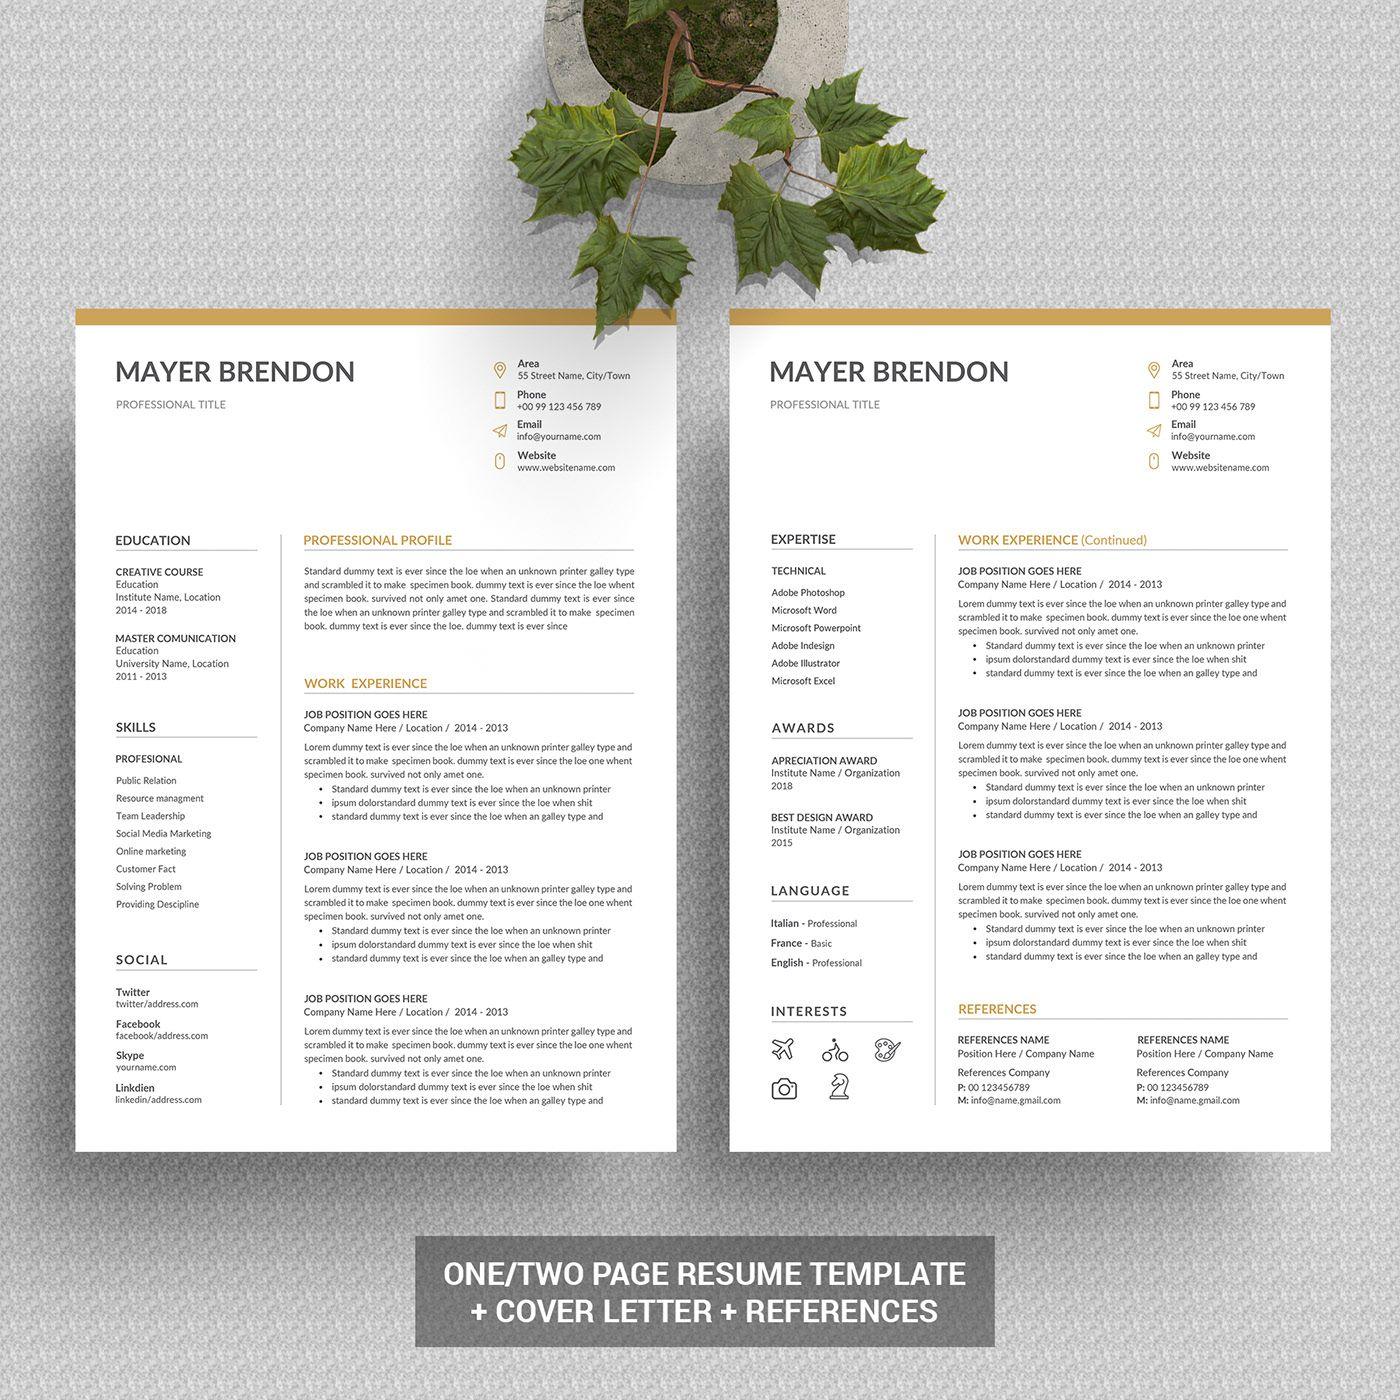 jpixel 55 on Behance Unique resume template, Resume